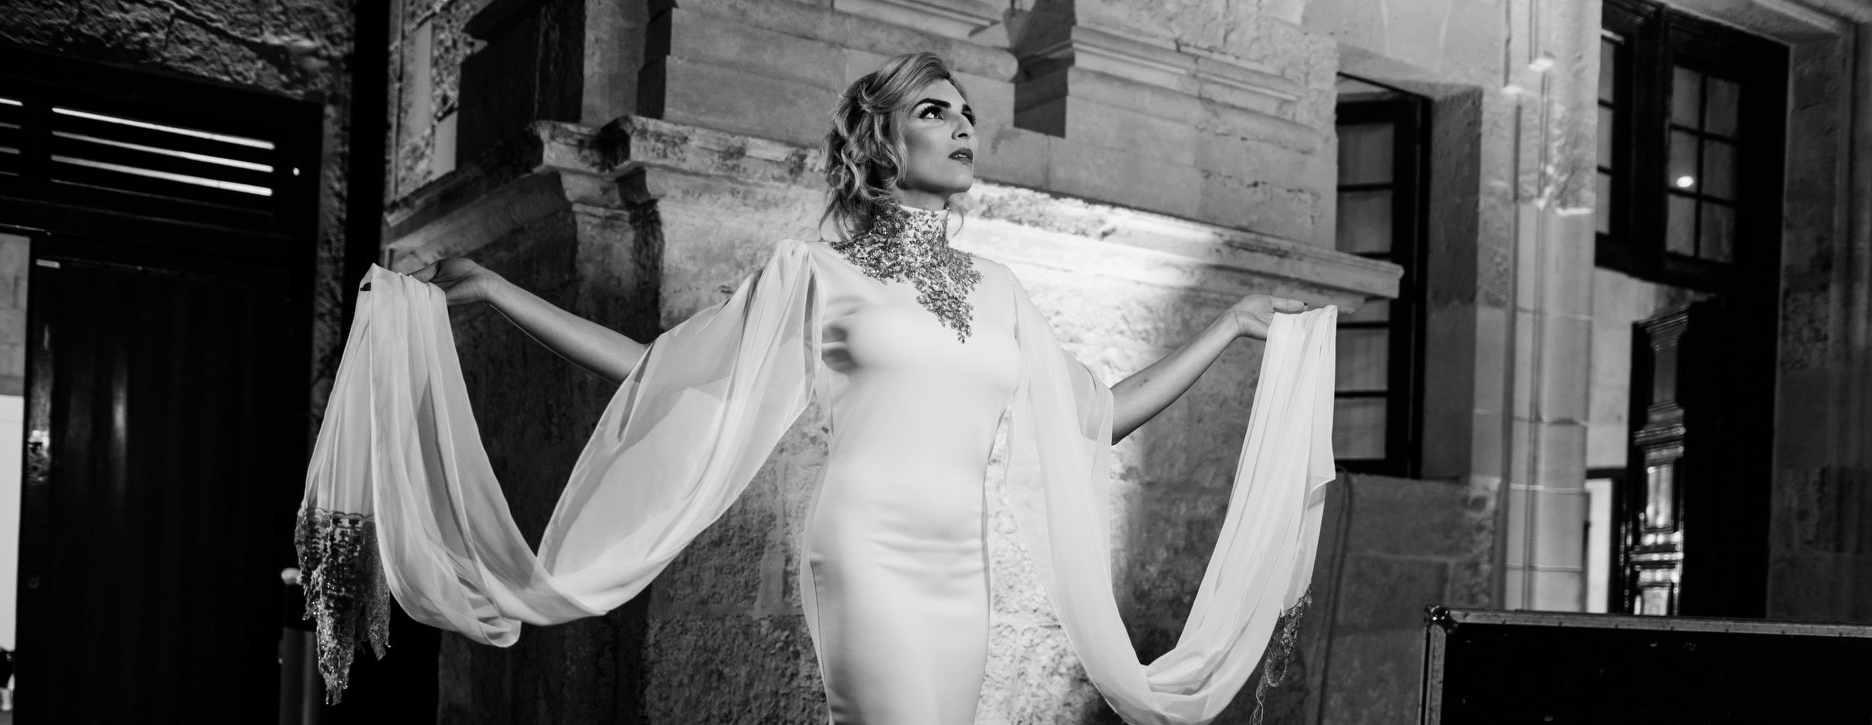 Meet Malta's Transgender Queen, Karly May 👸🏼